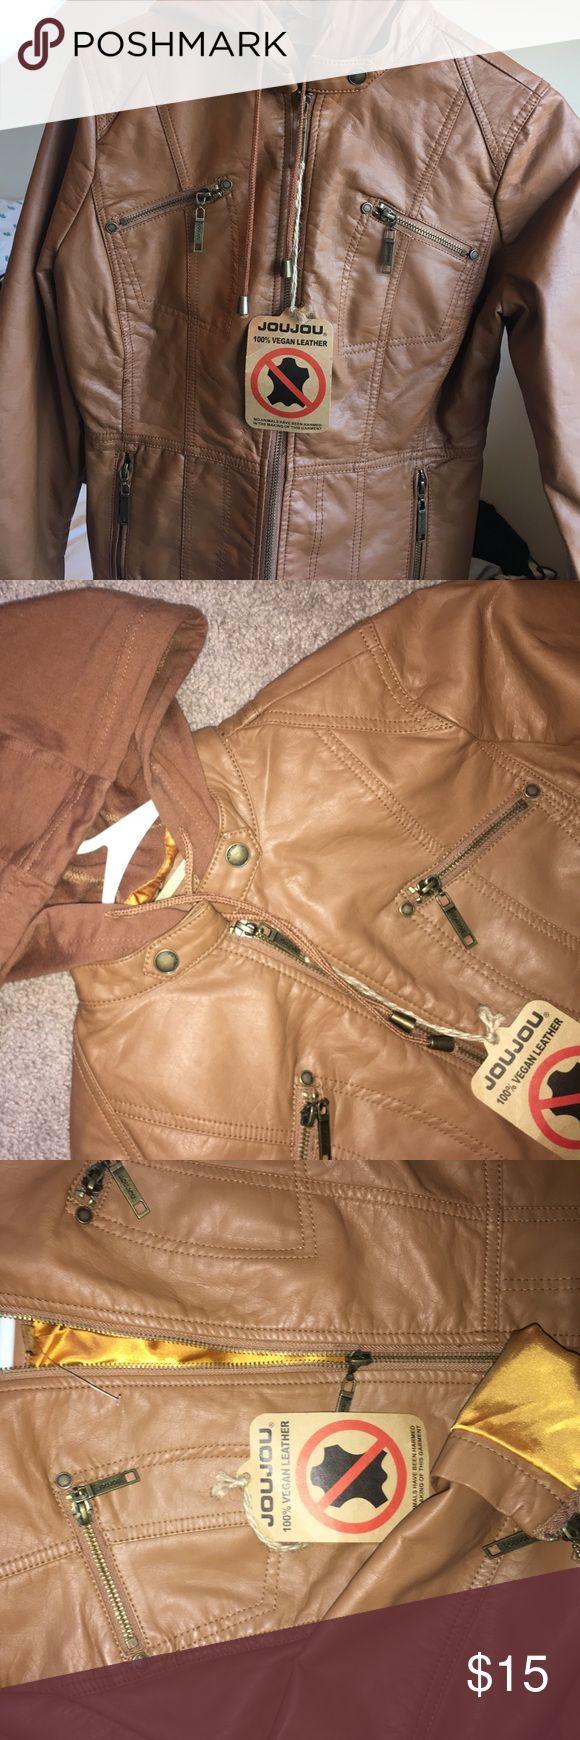 carmel colored vegan hooded leather jacket brand new awesome vegan leather joujou Jackets & Coats